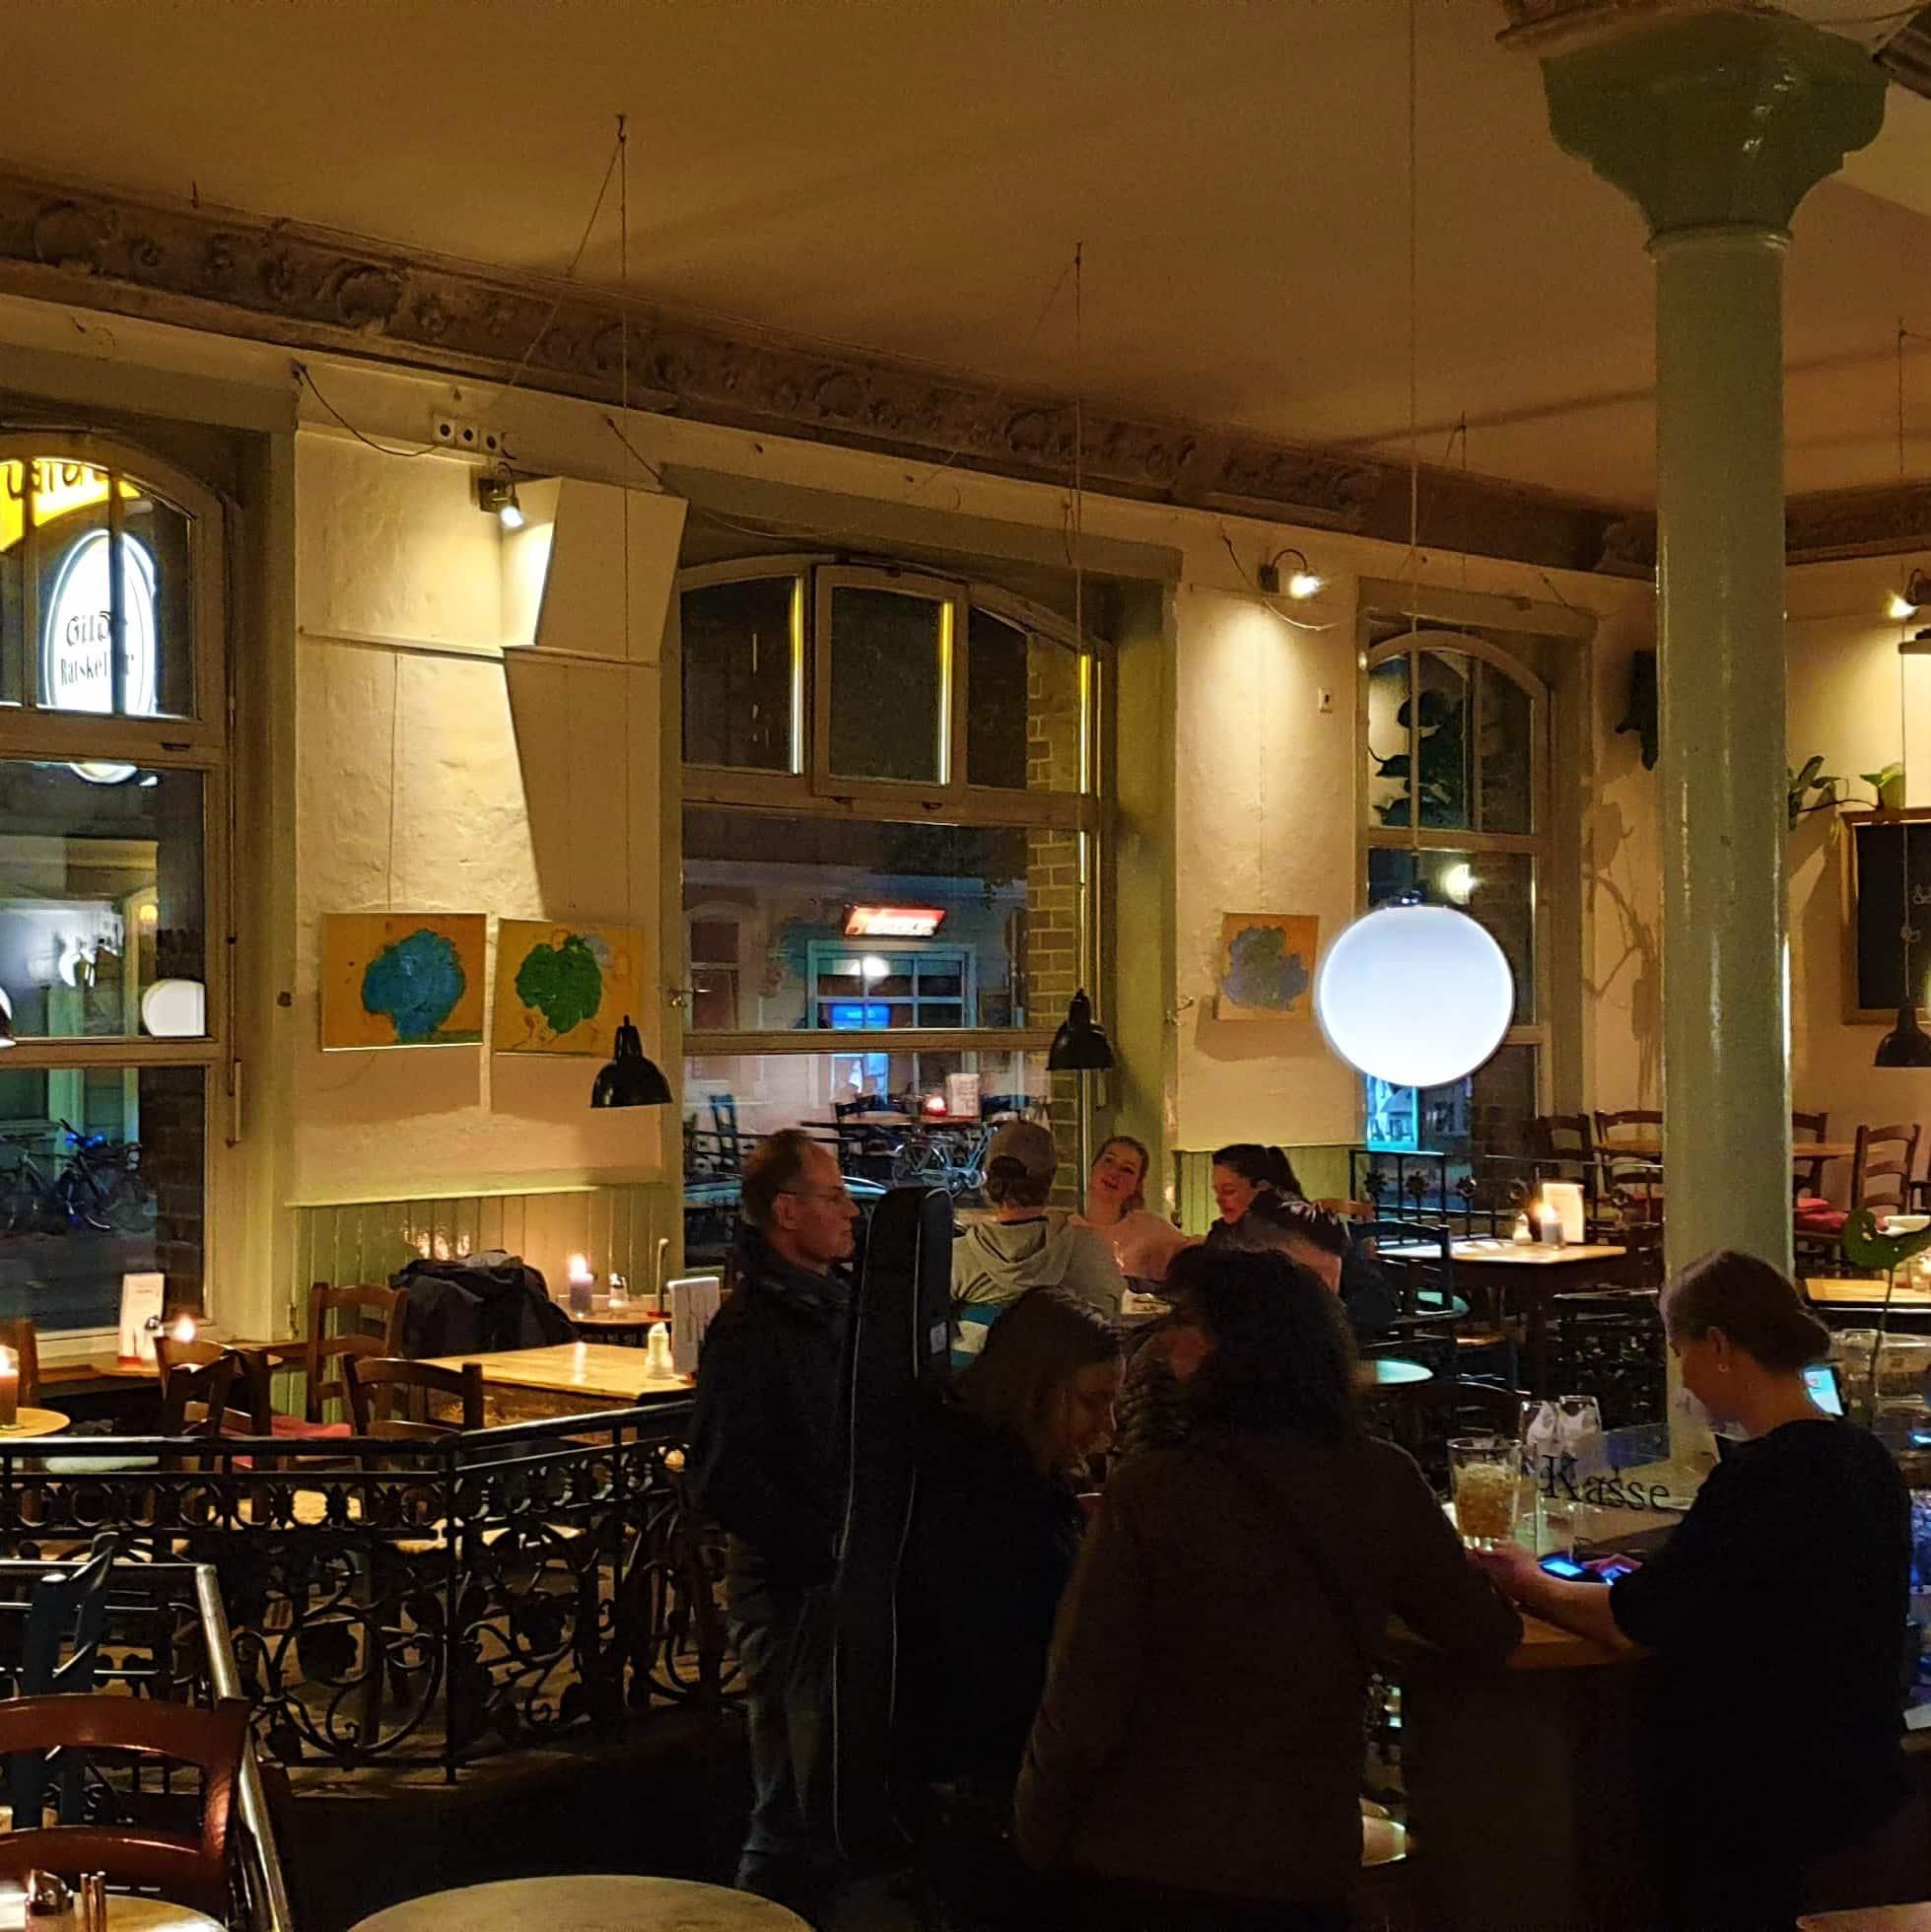 Style Hannover Cafe Safran 6 - Café Safran: Urgestein in Hannovers Gastronomie